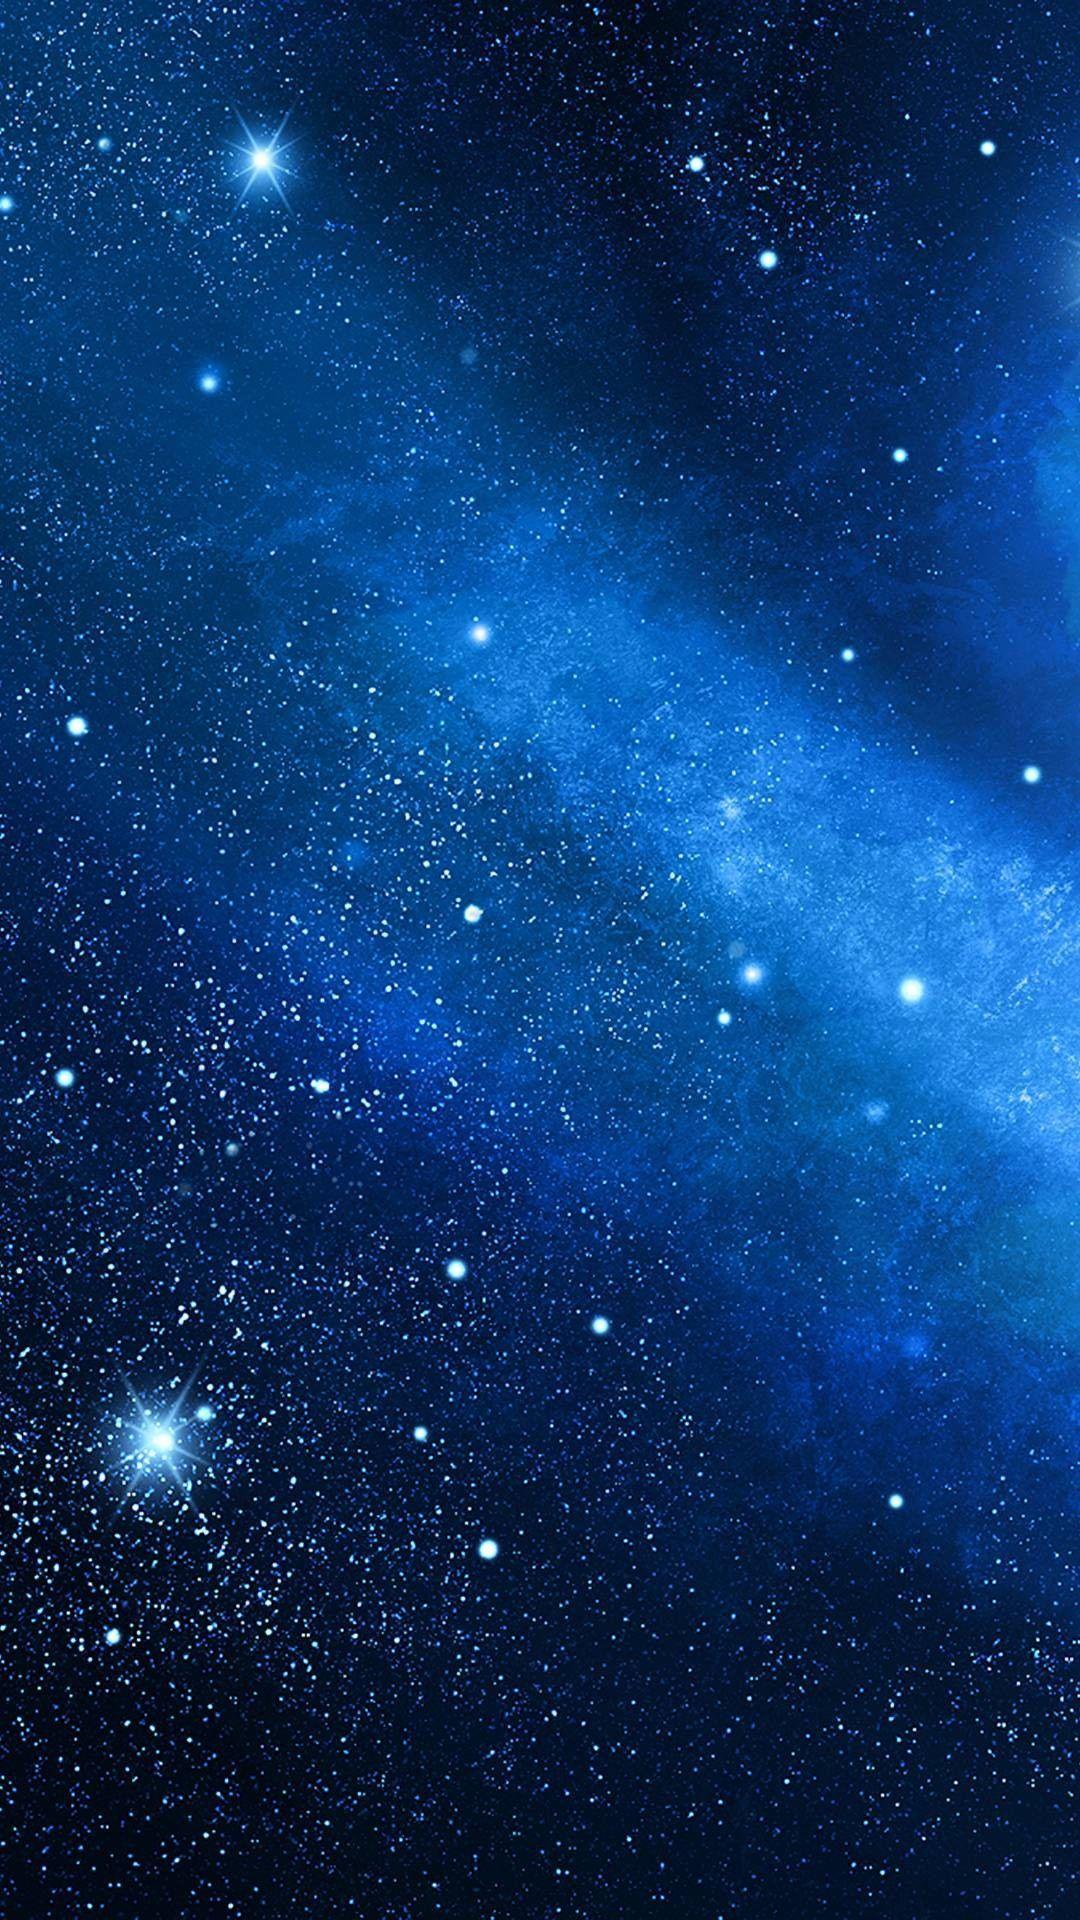 Galaxy Wallpaper Descargar Hupages Iphone Fondos Blue Galaxy Wallpaper Dark Blue Wallpaper Hd Galaxy Wallpaper Ideas for galaxy dark blue wallpaper hd